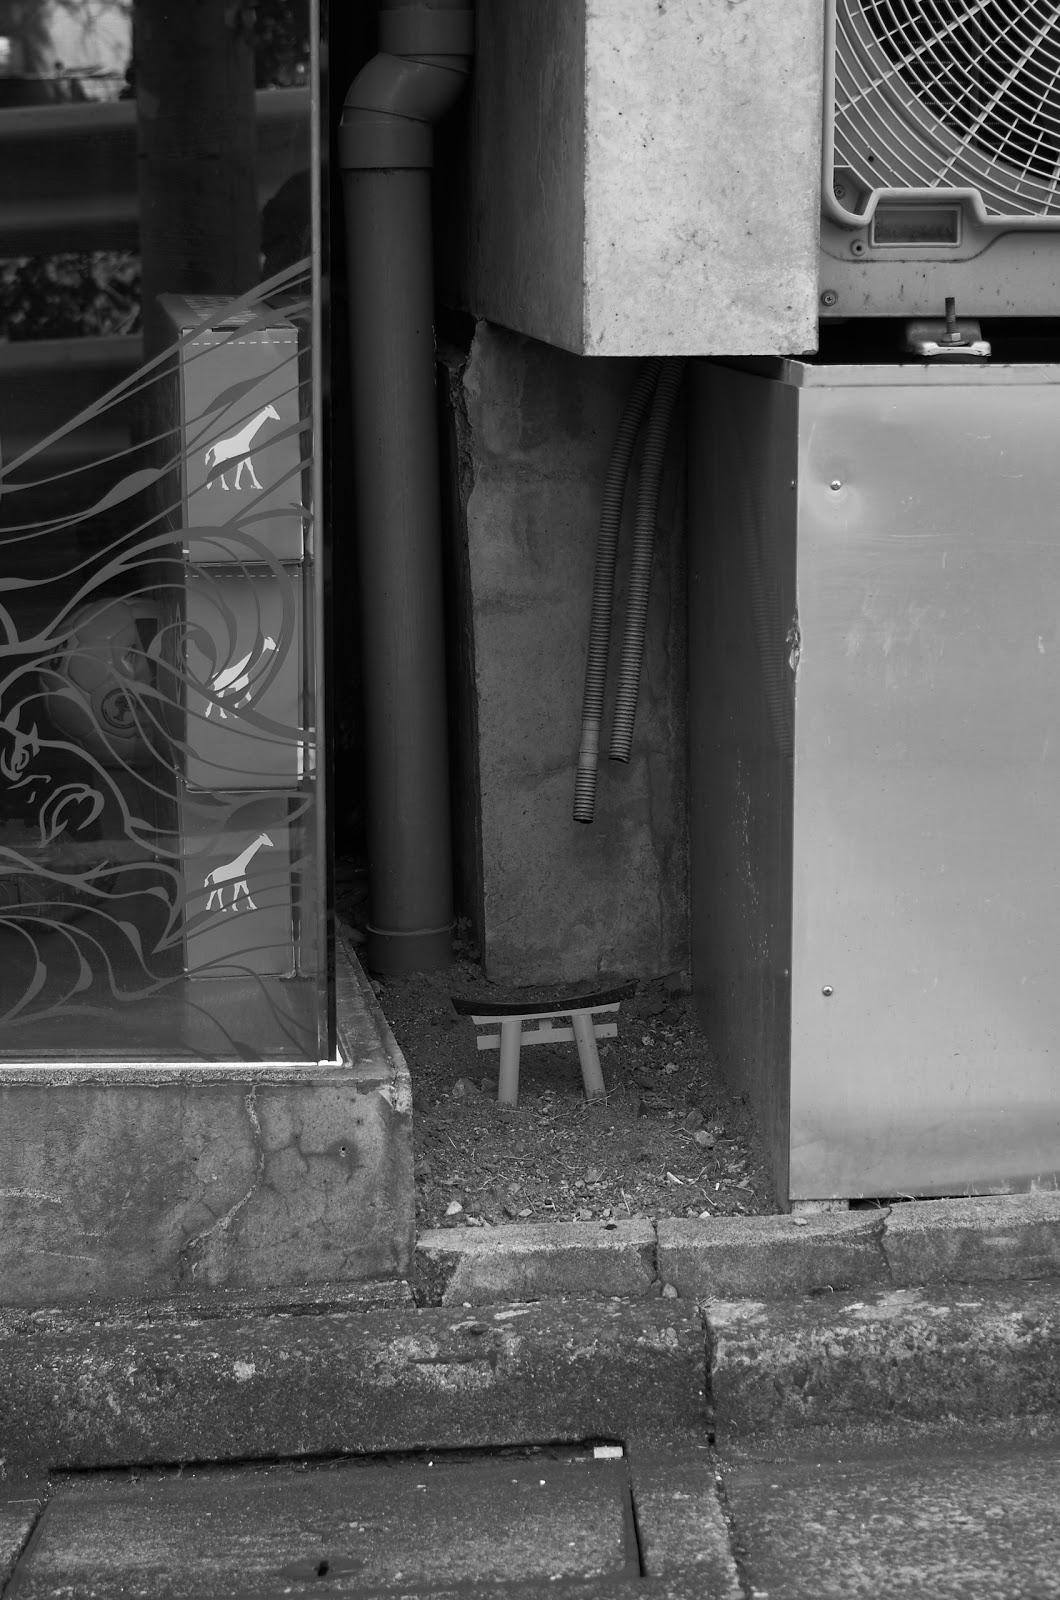 Shinjuku Mad - Darkness sounds familiar 01